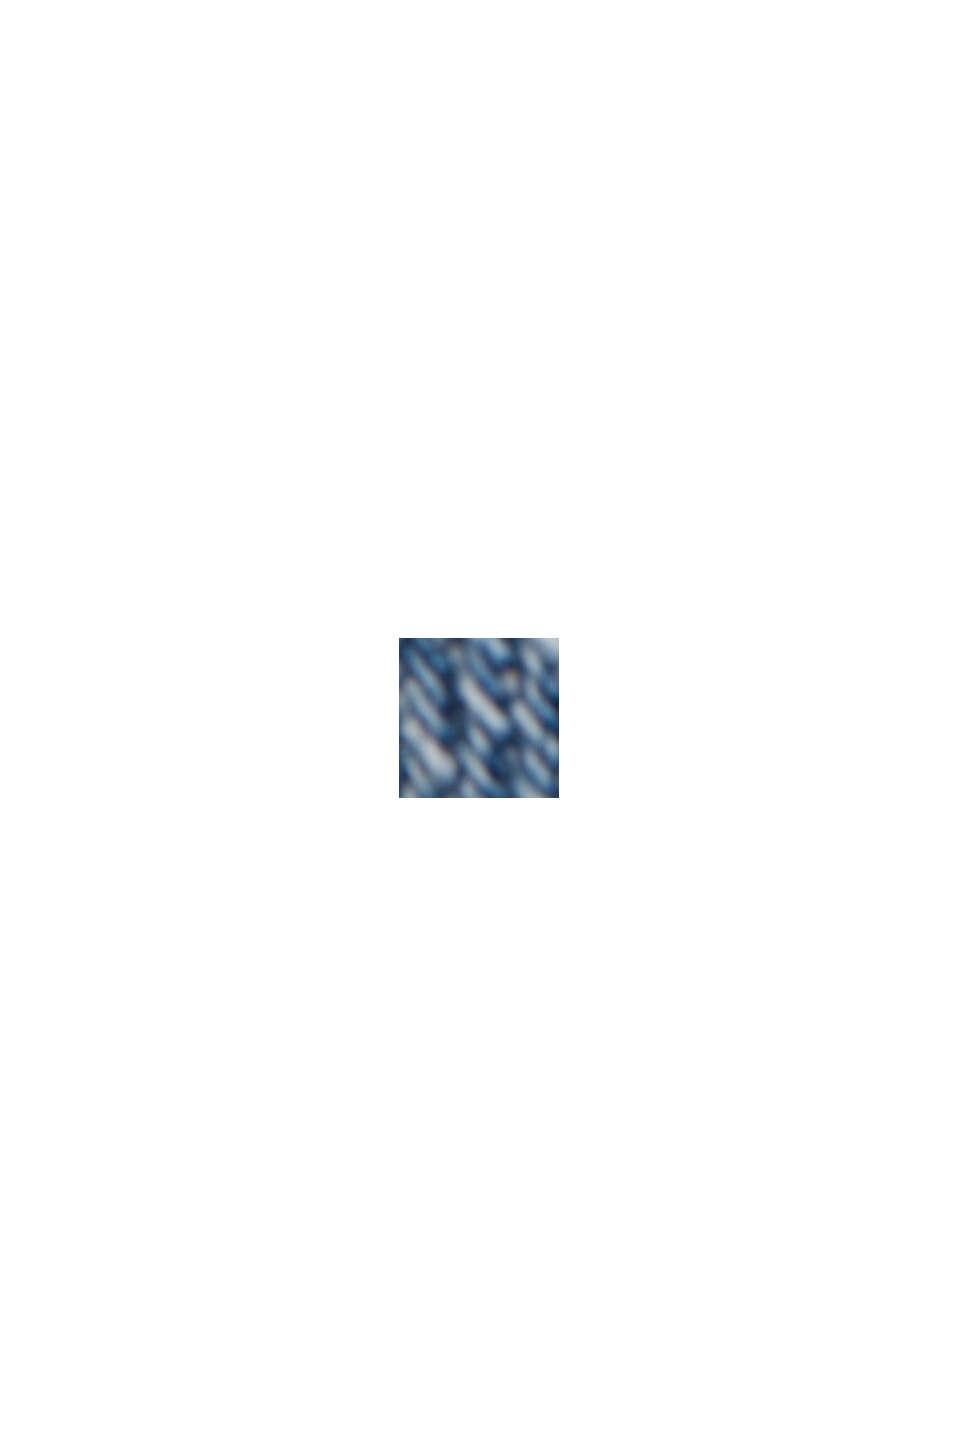 Vaqueros cortos de algodón ecológico, BLUE LIGHT WASHED, swatch